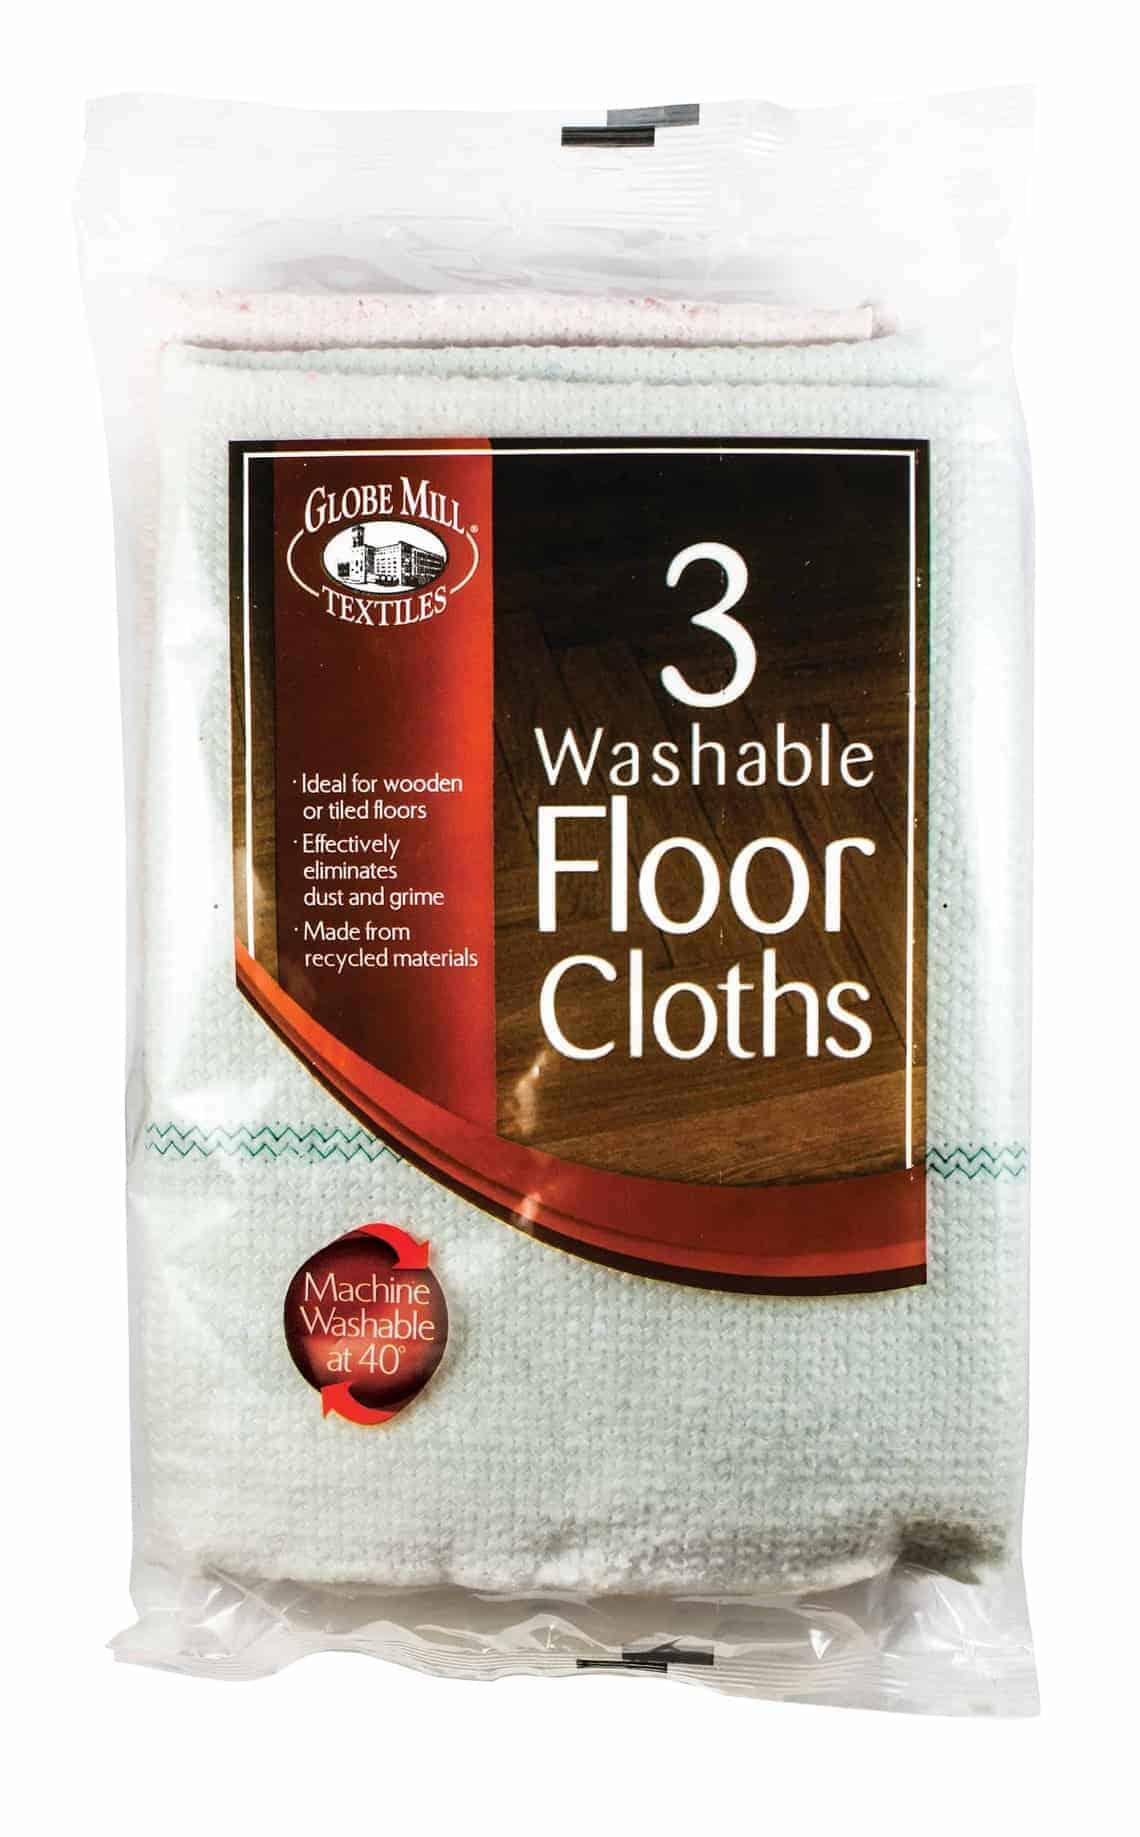 Globe Mill 3pk Floor Cloths